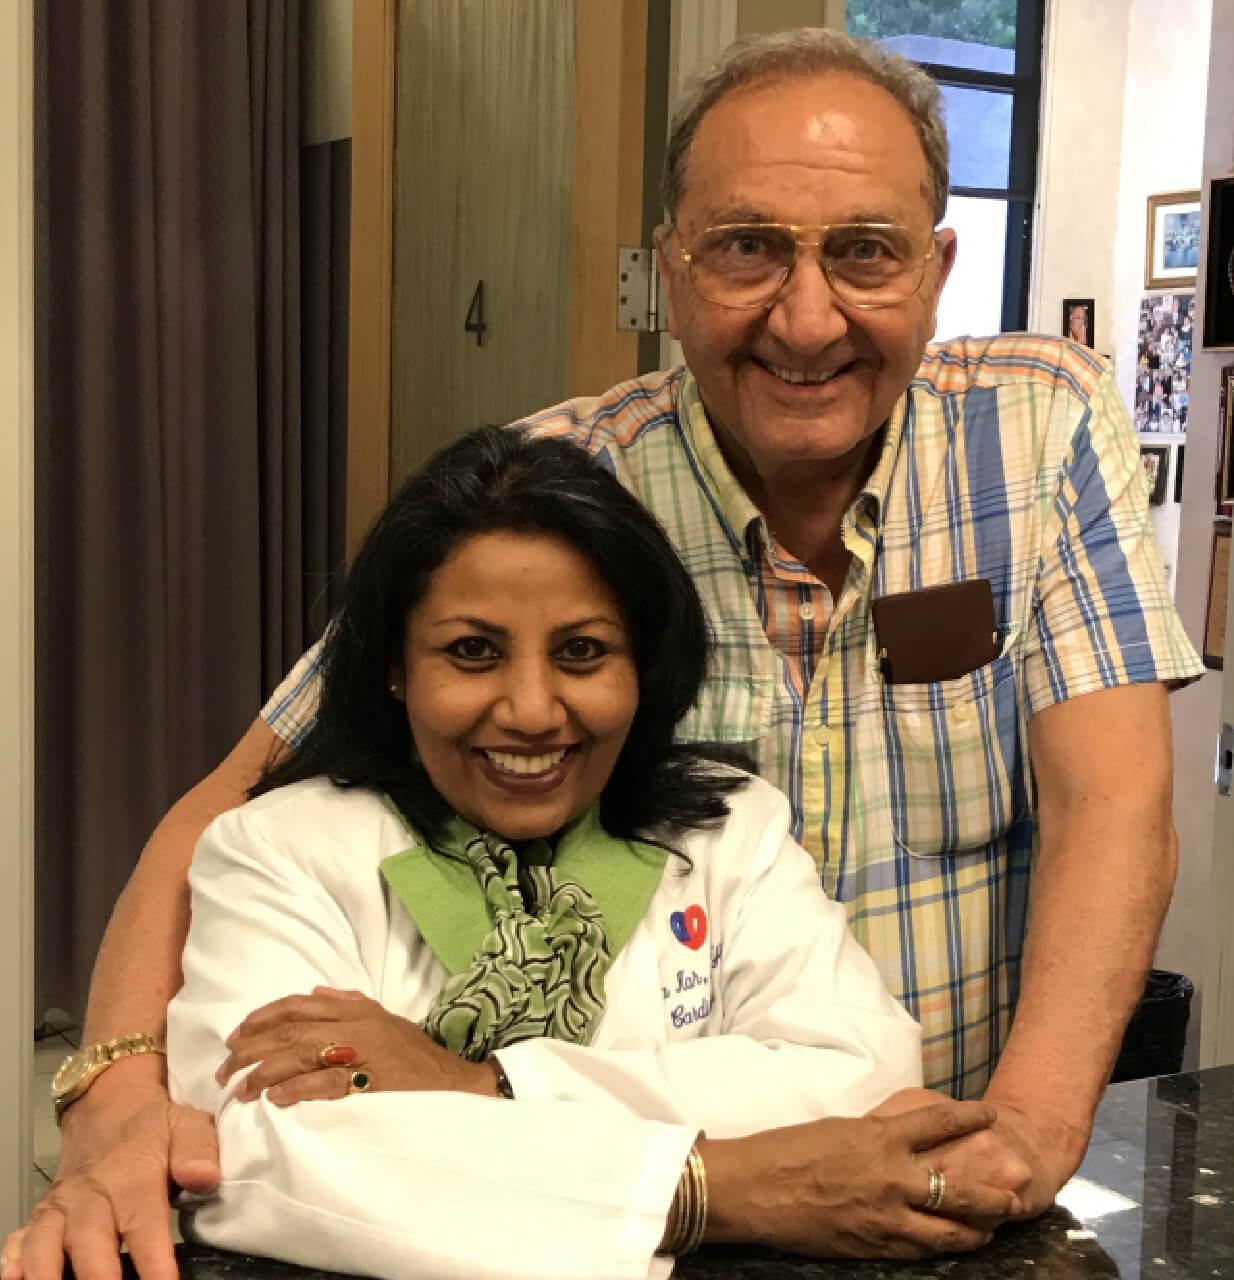 Sheila Kar with happy patient photo #2